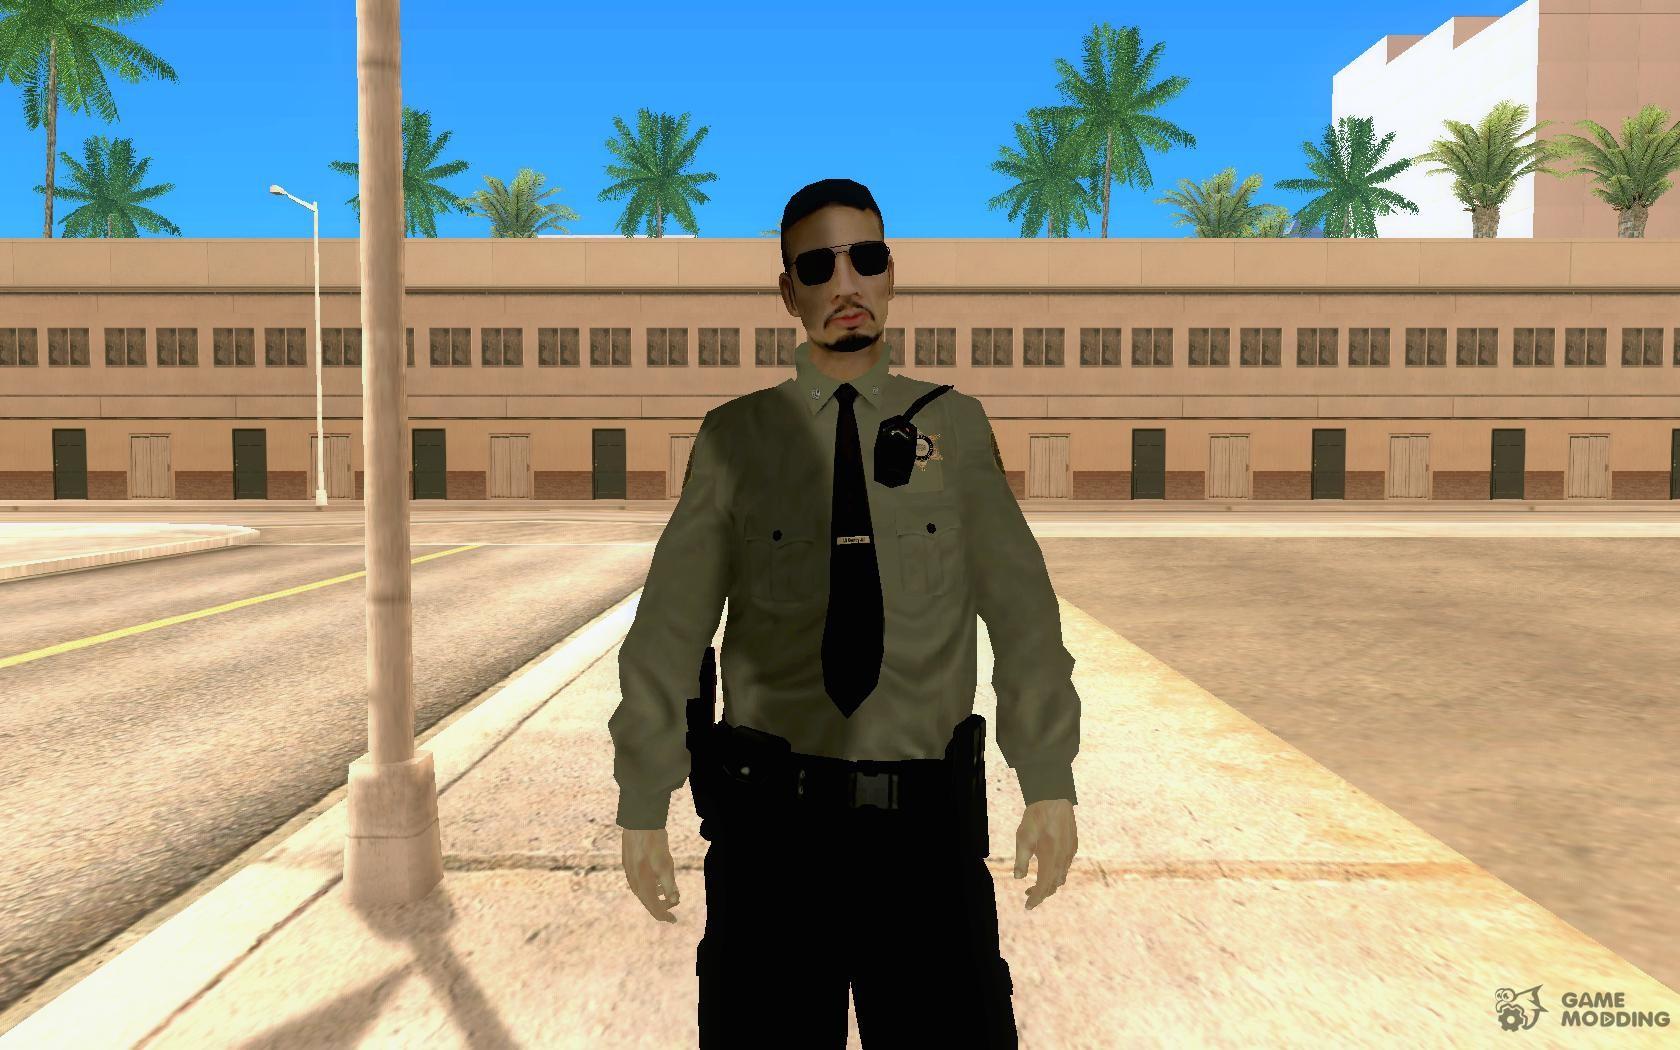 Коды к GTA: San Andreas: Все коды 98